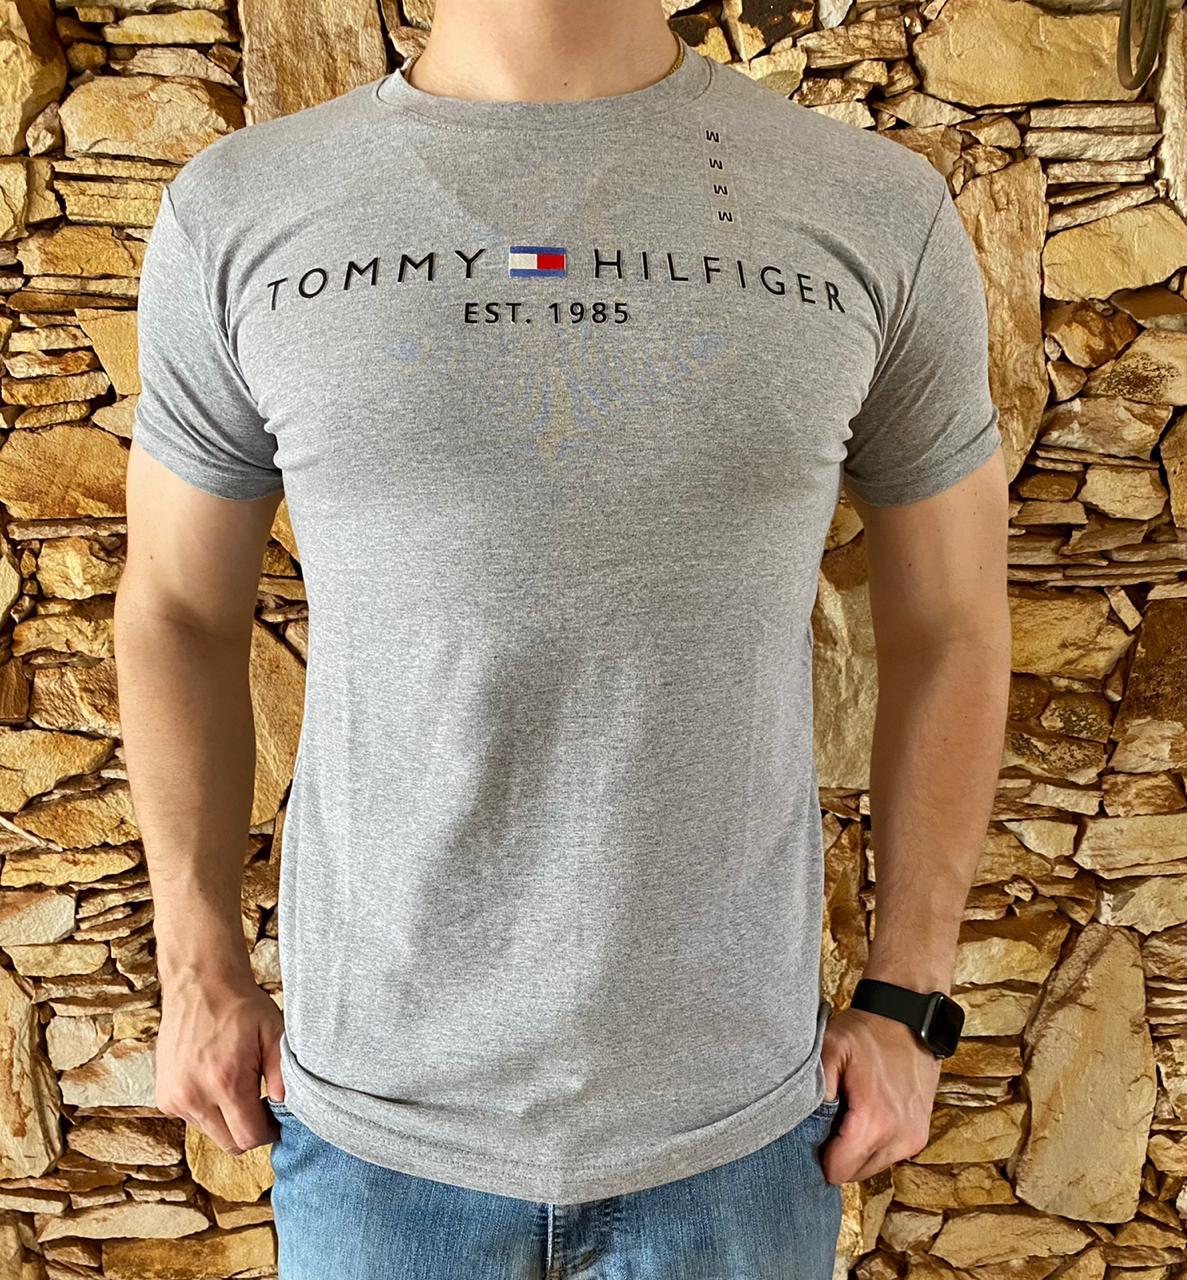 Camiseta Masculina Tommy Hilfiger Algodão Mescla - Cinza